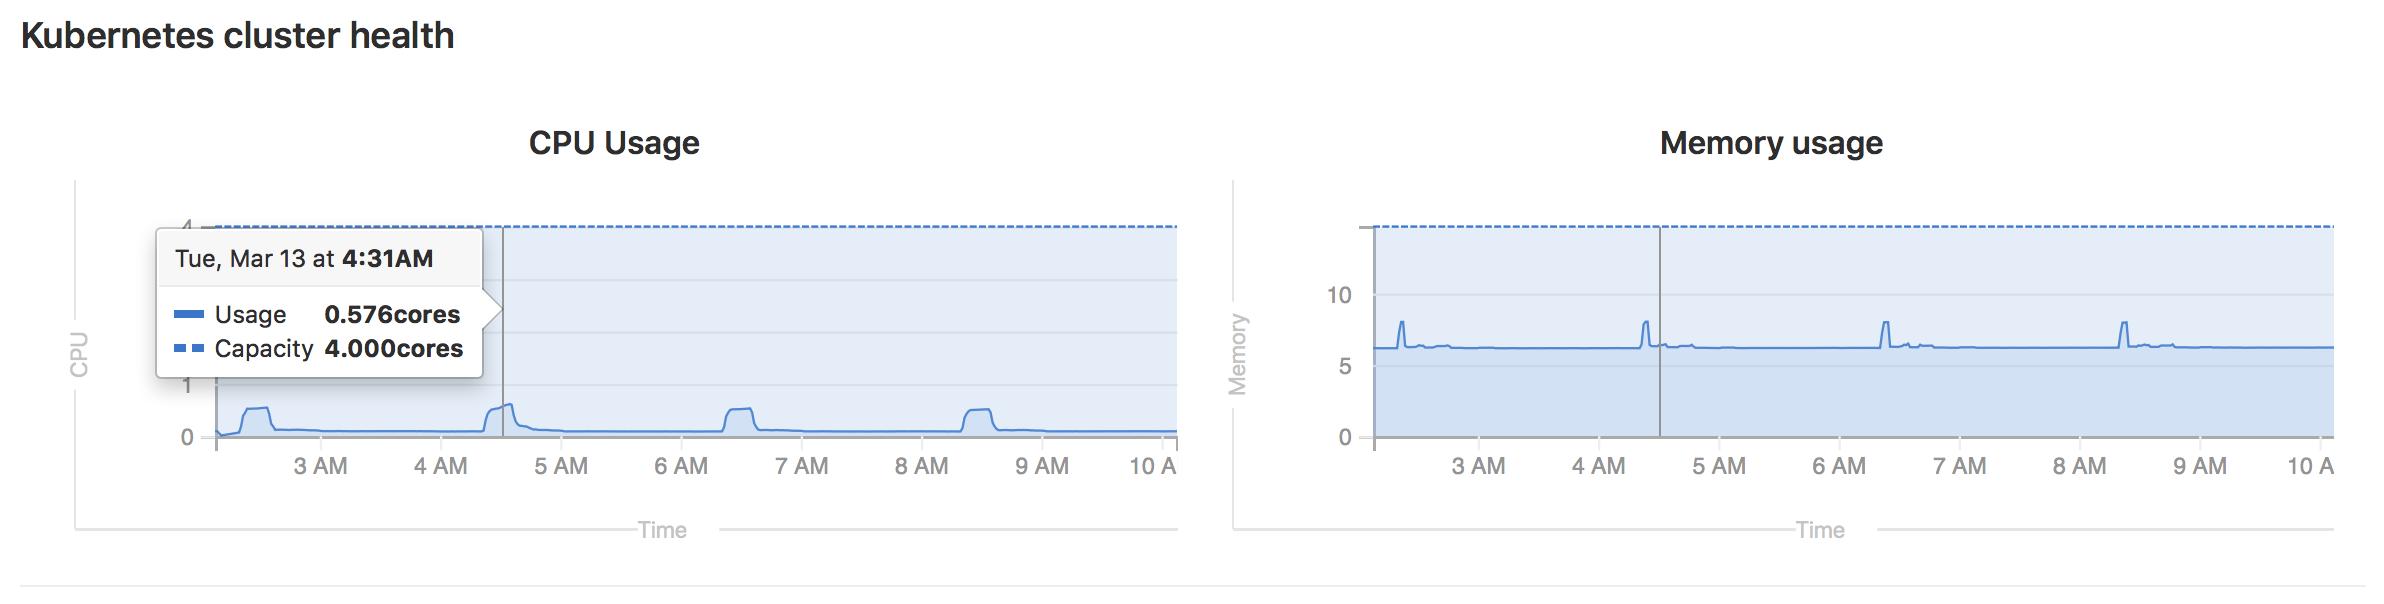 Kubernetes cluster monitoring